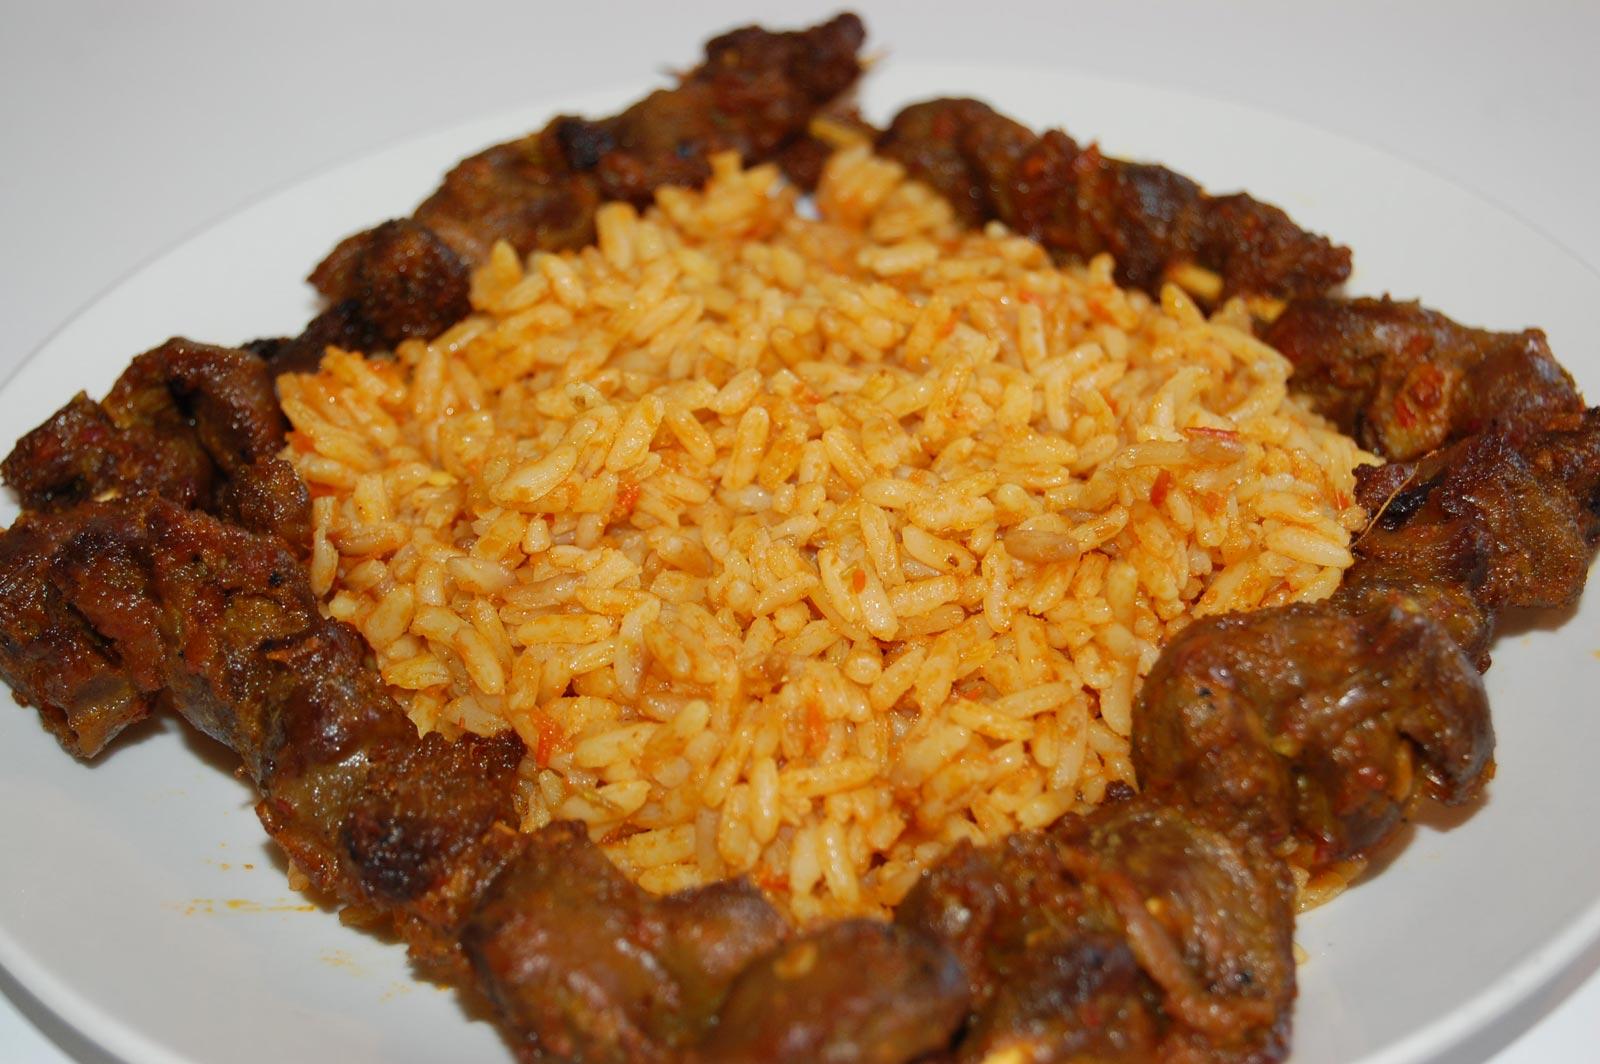 nigerian-food-recipes-jollof-rice-i17-(1)